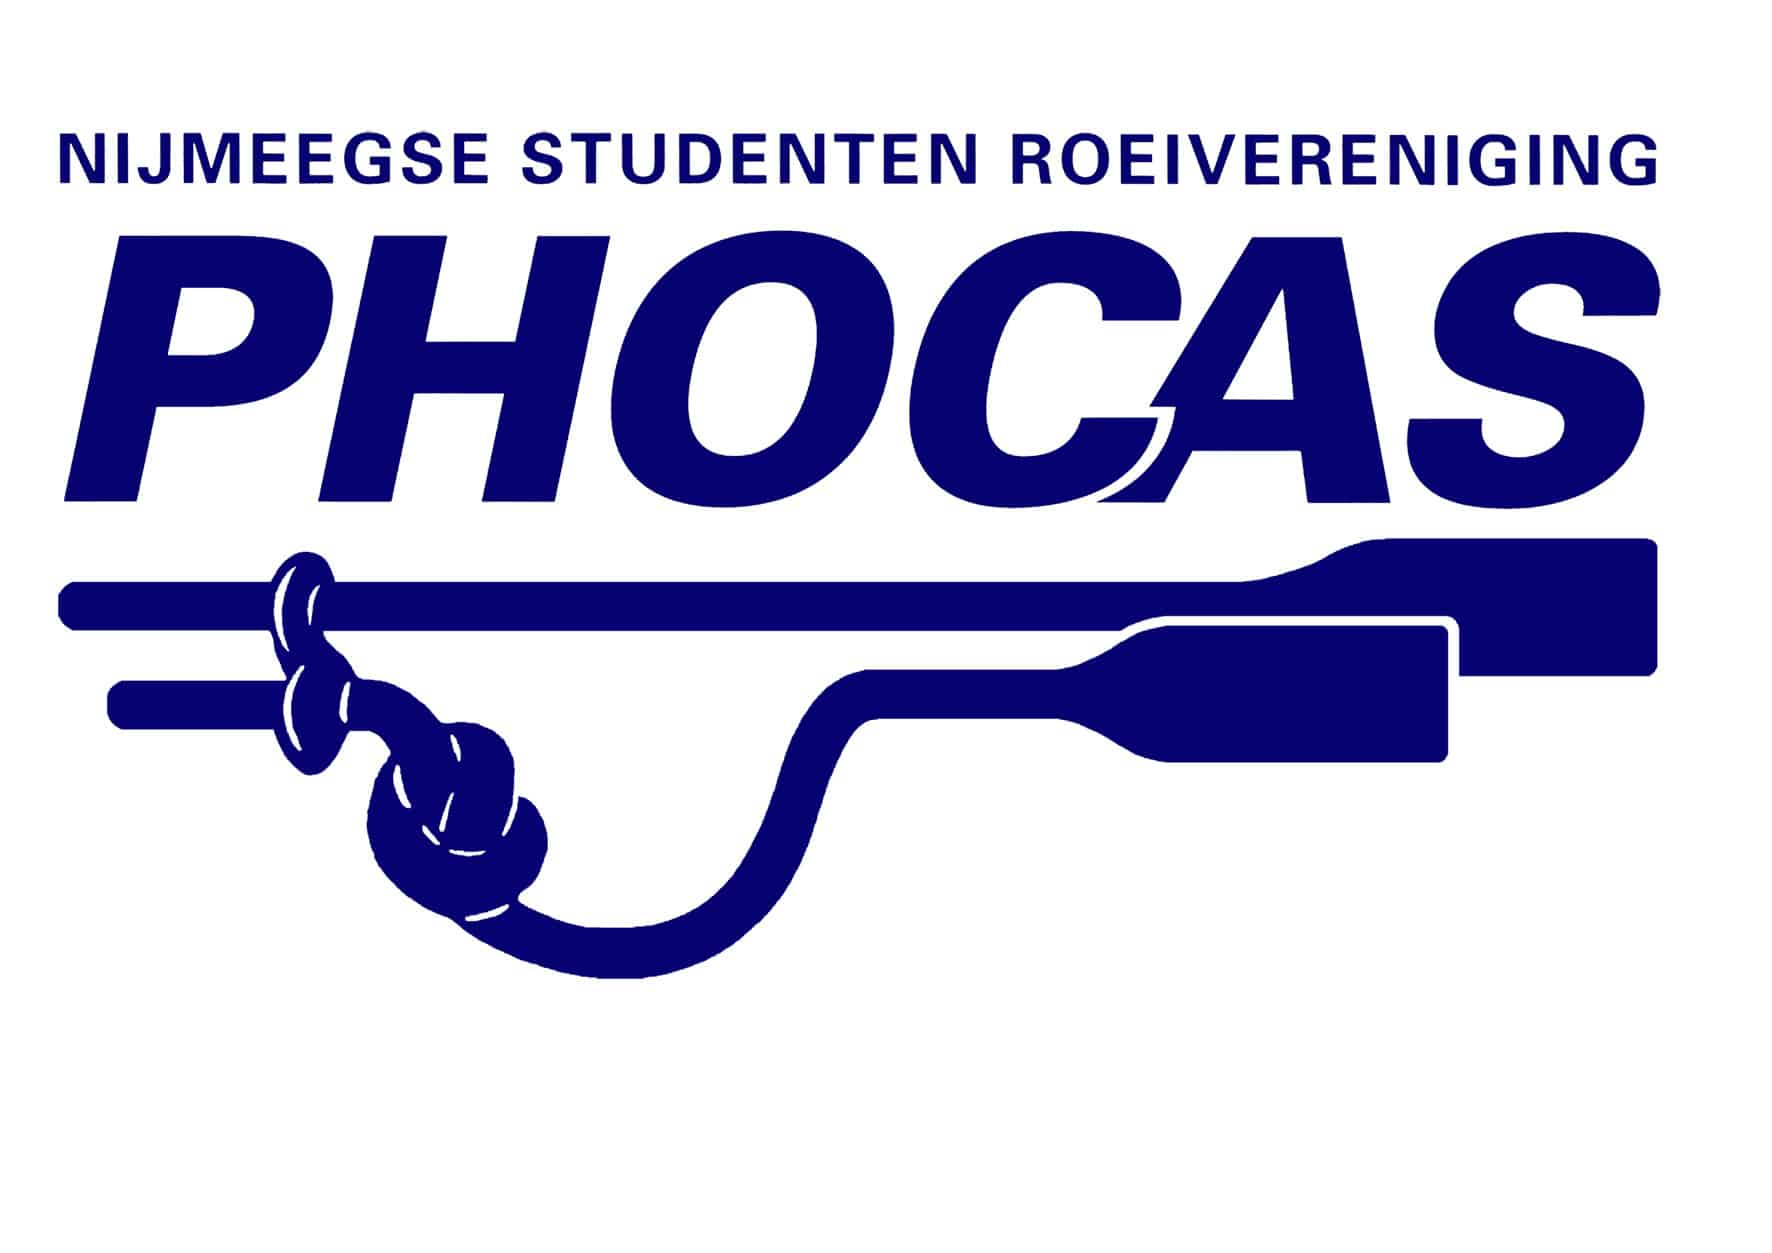 N.S.R.V. Phocas